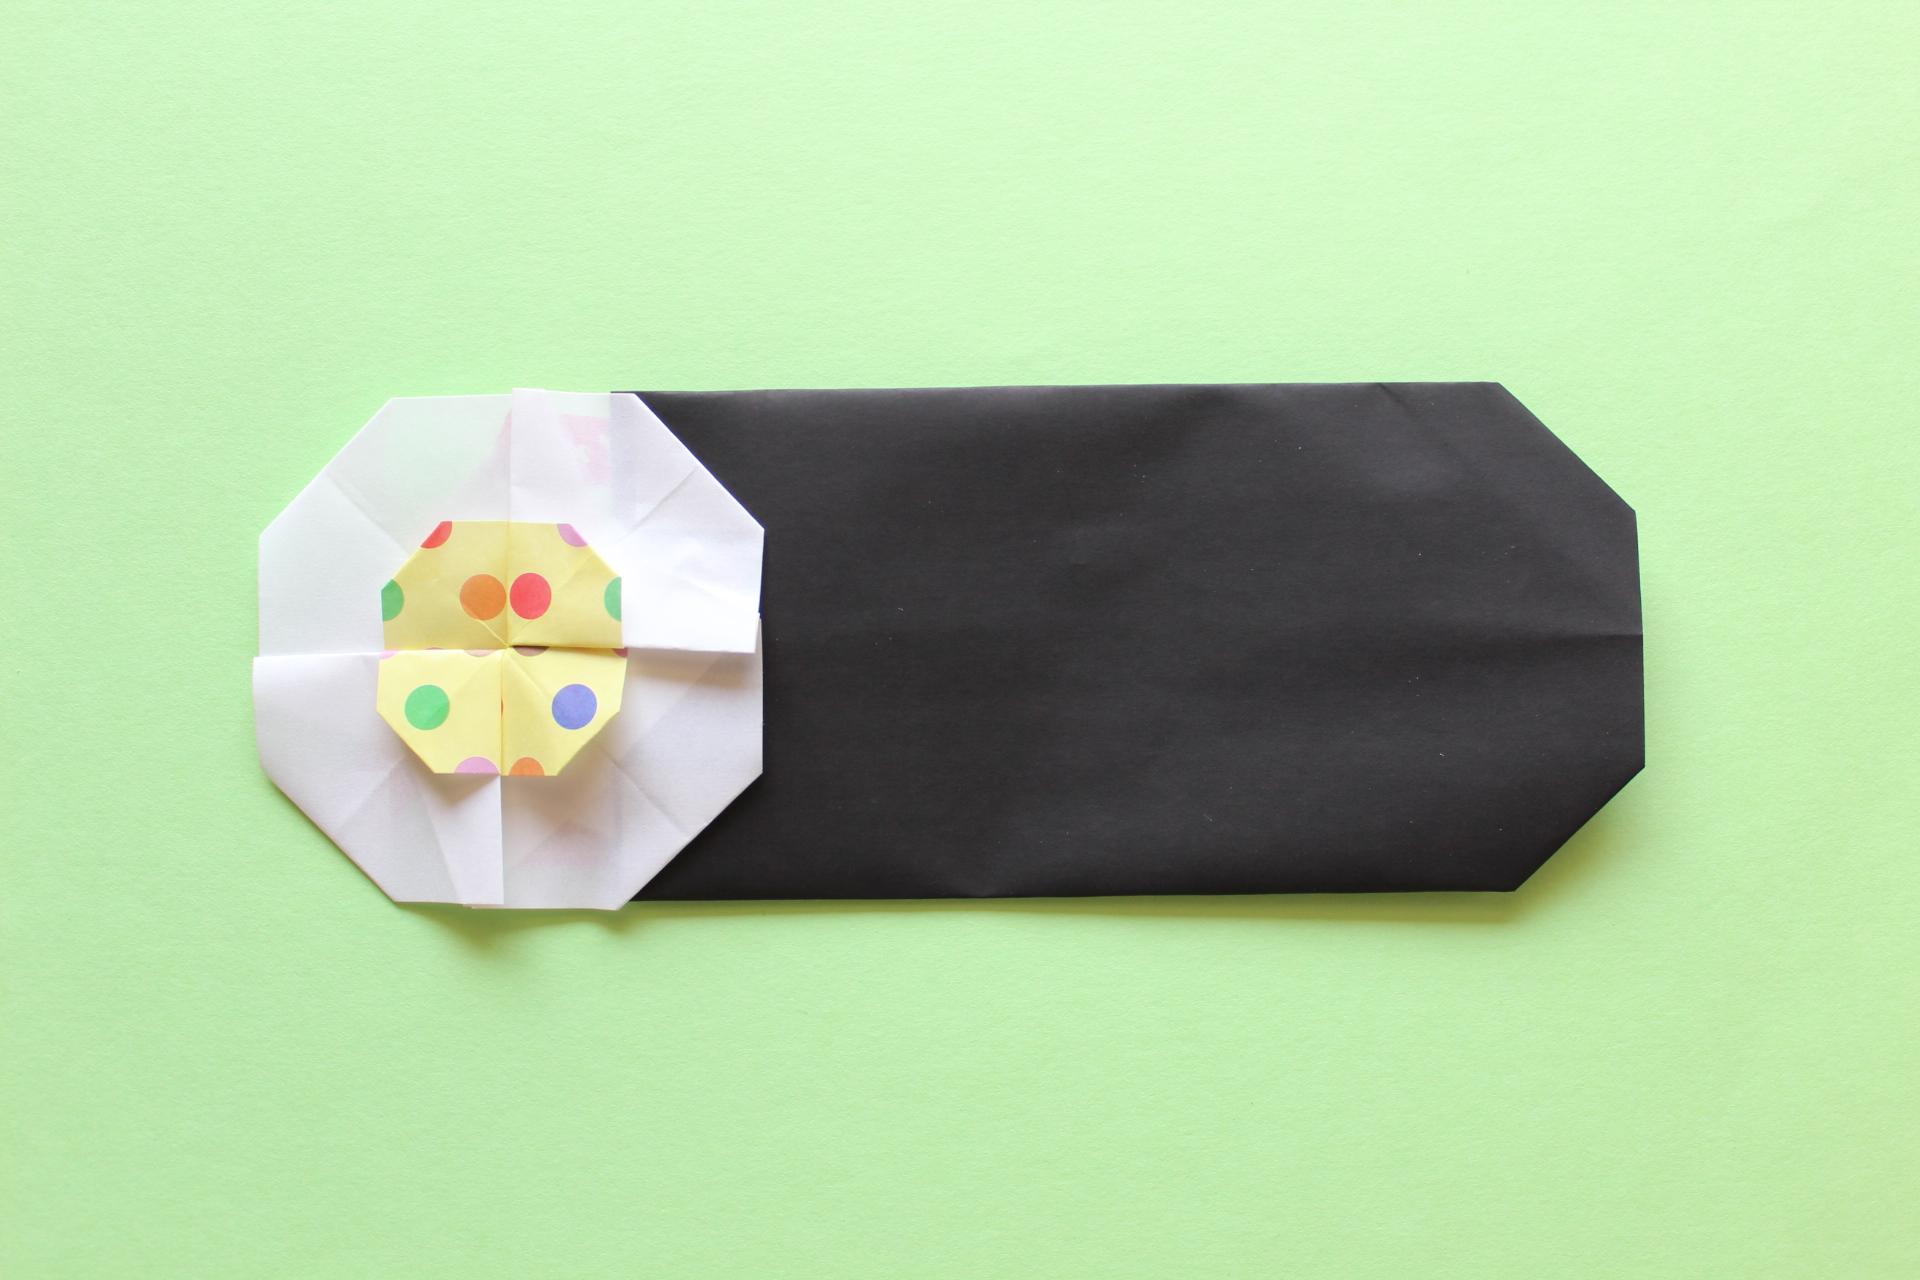 折り紙で恵方巻きの折り方